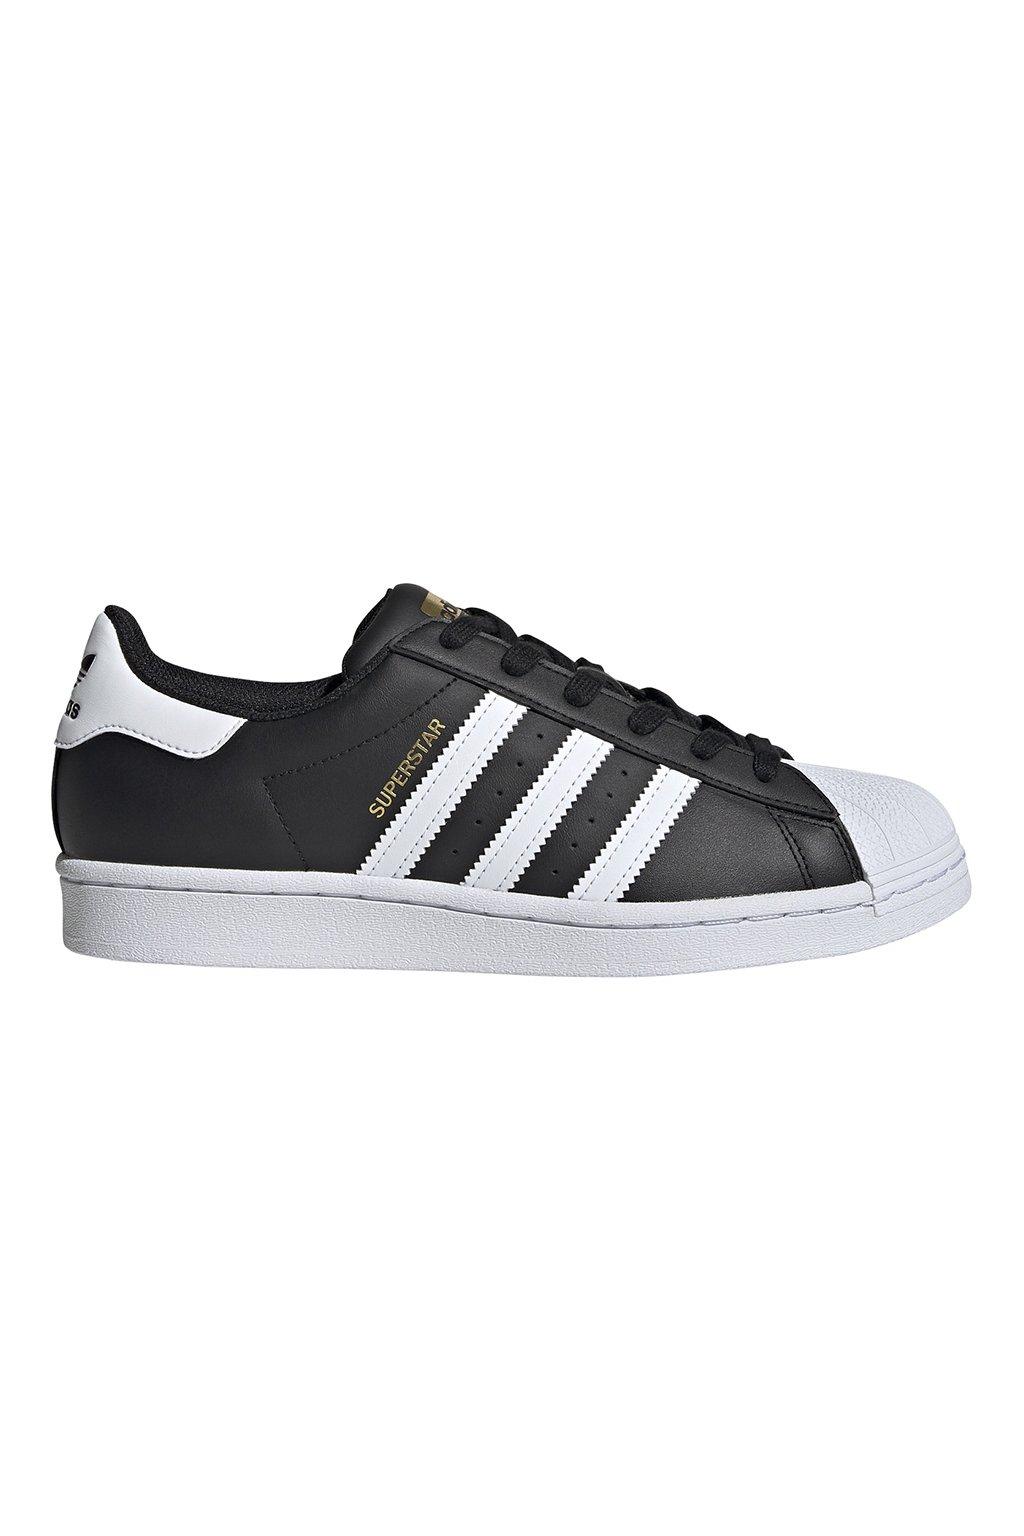 Dámska obuv Adidas Superstar W čierne FV3286